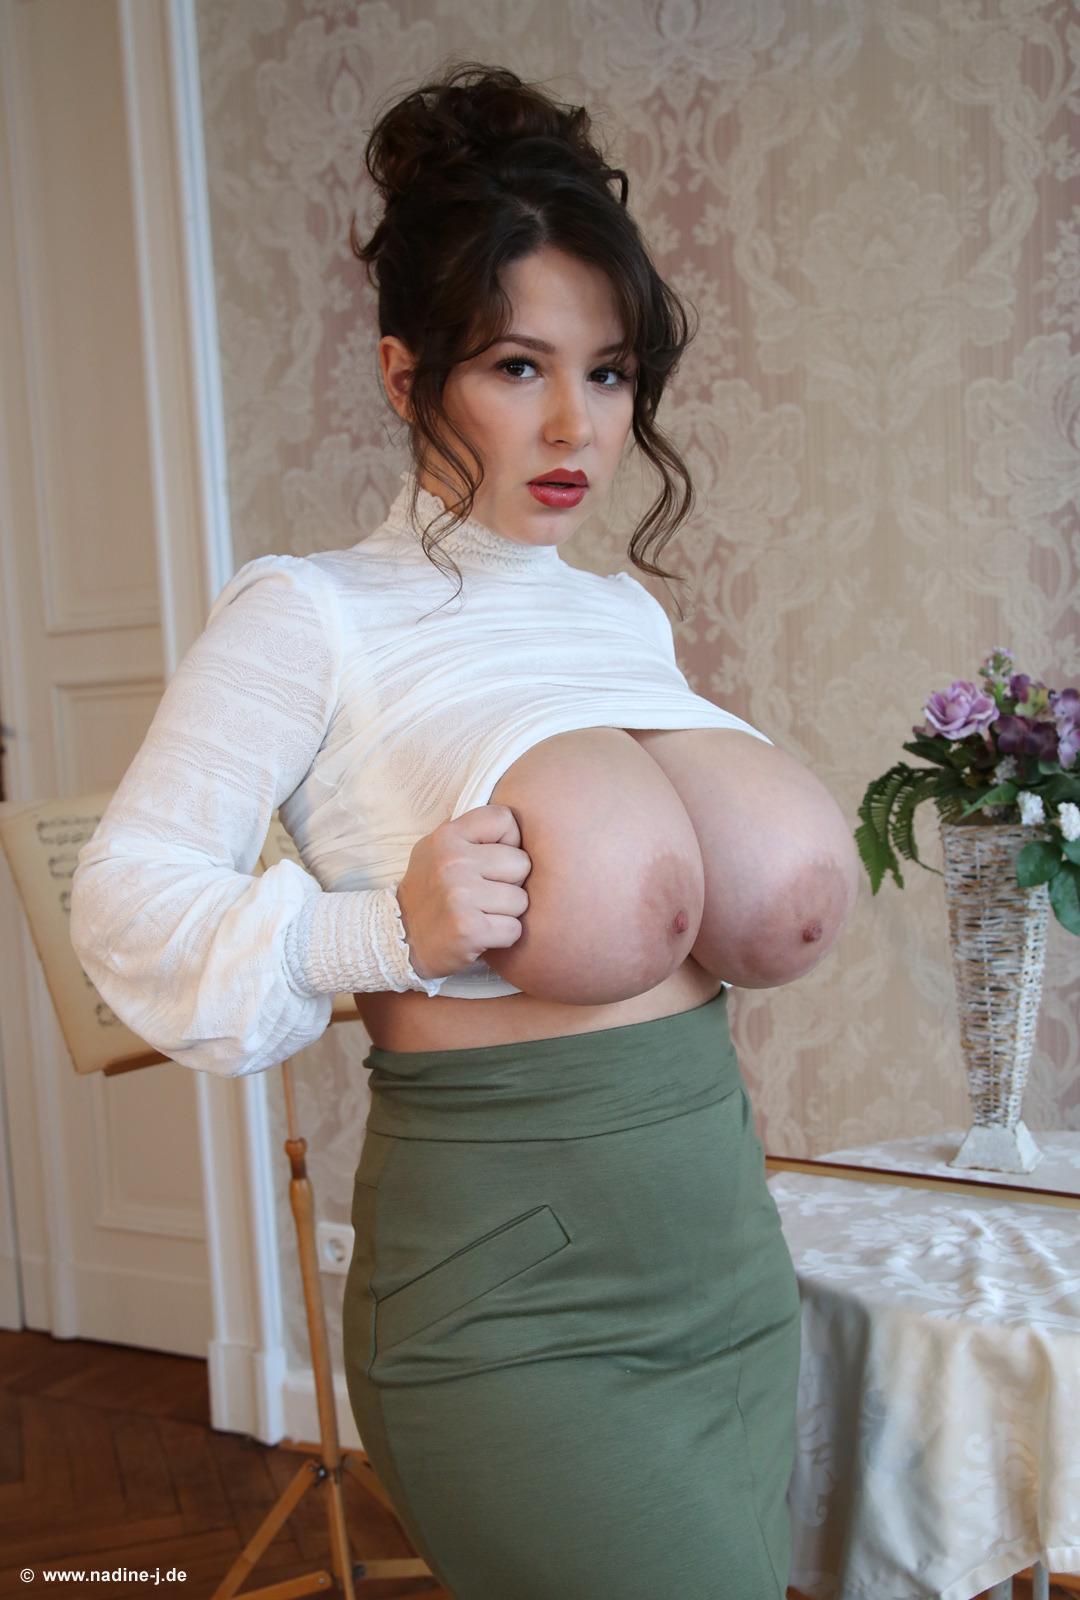 from Grady stacy keibler nude having sex